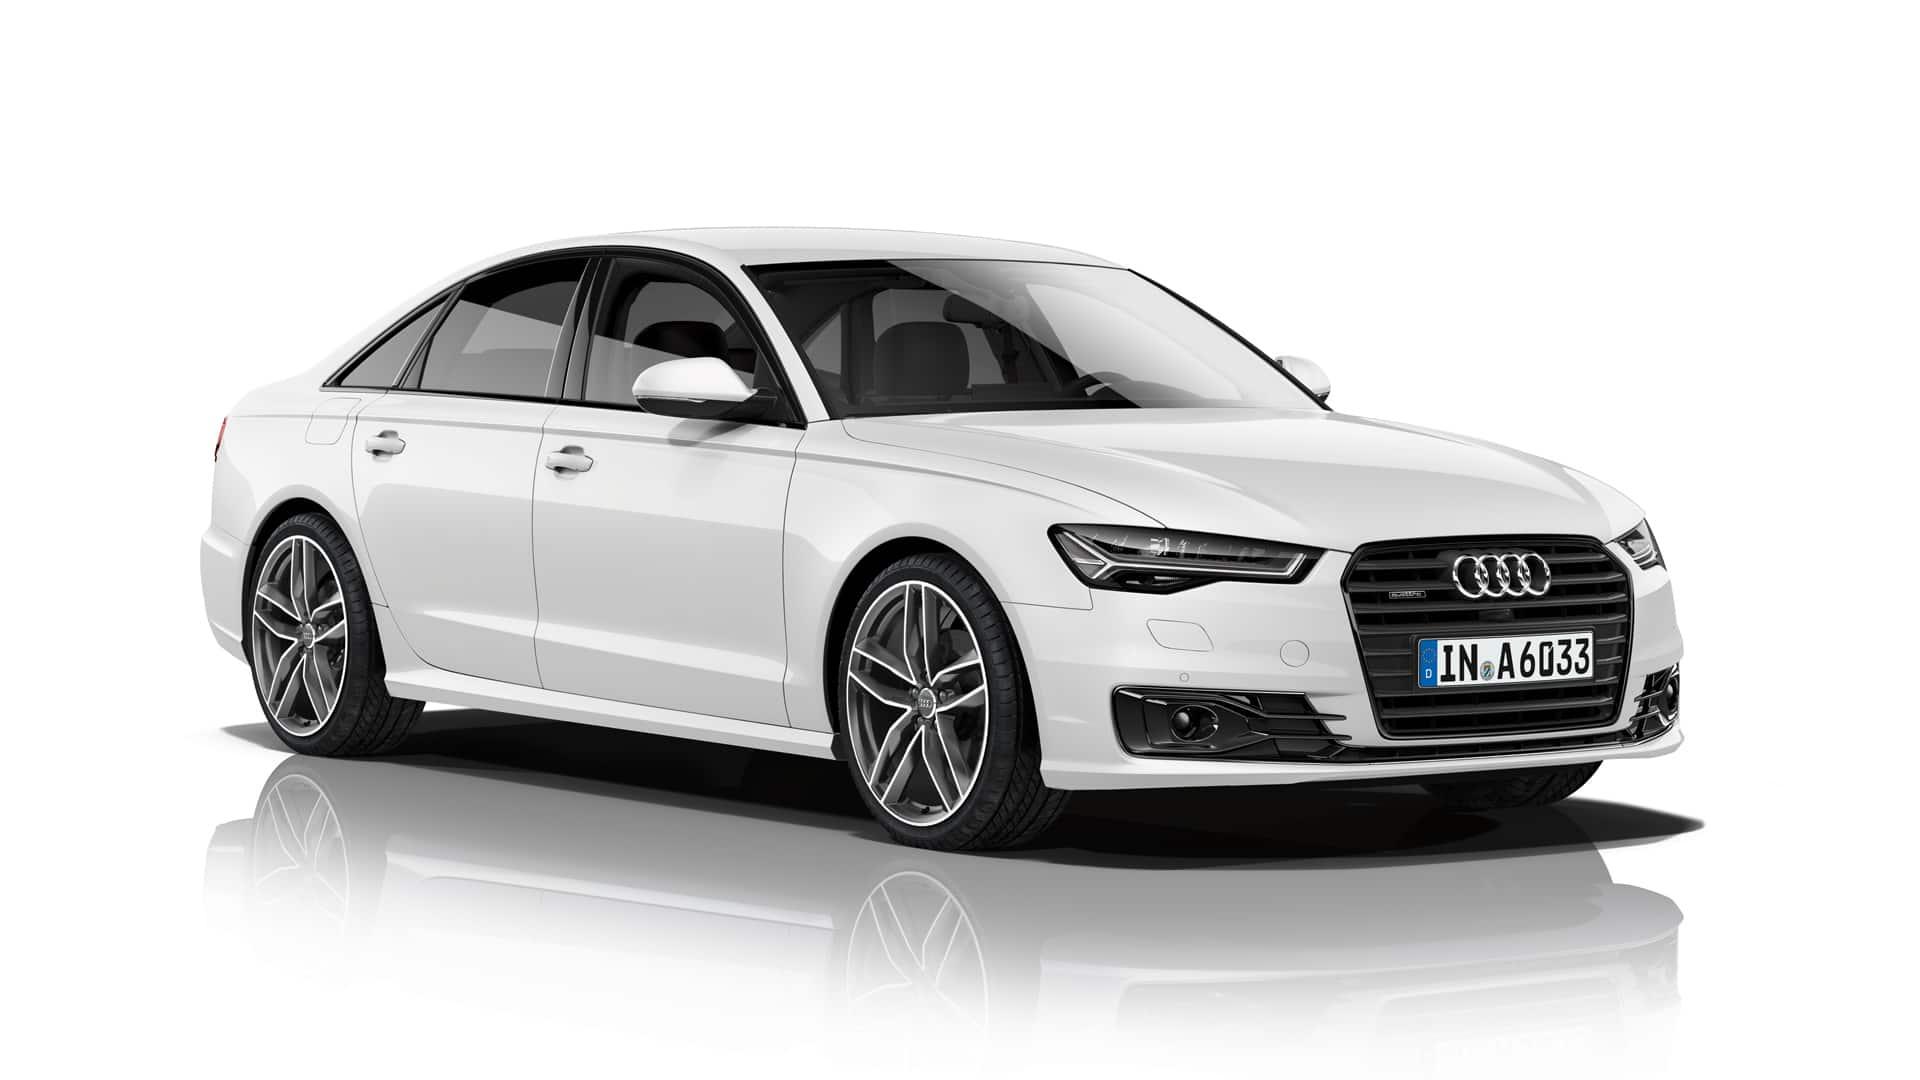 Audi r8 2010 price new 10